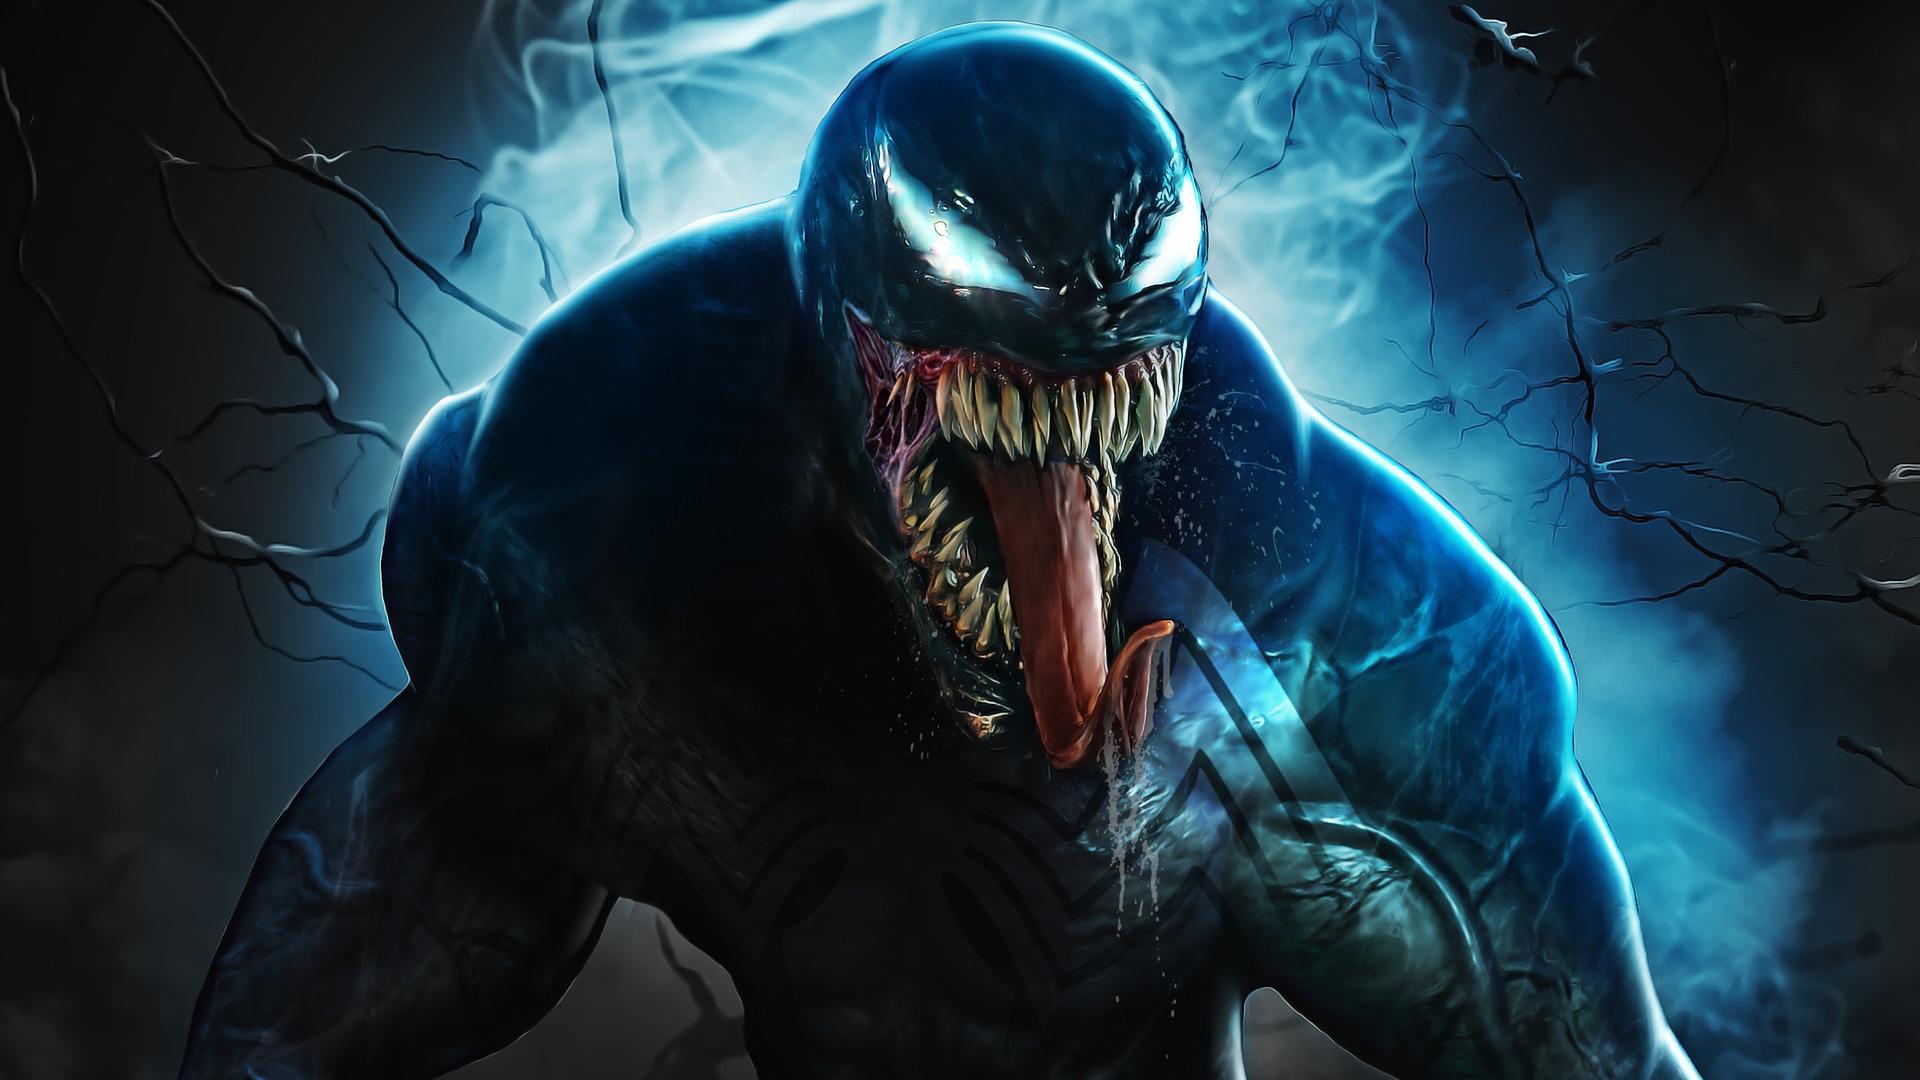 Veneno Hd Wallpaper Venom Fondo De Pantalla Hd Fondo De Escritorio